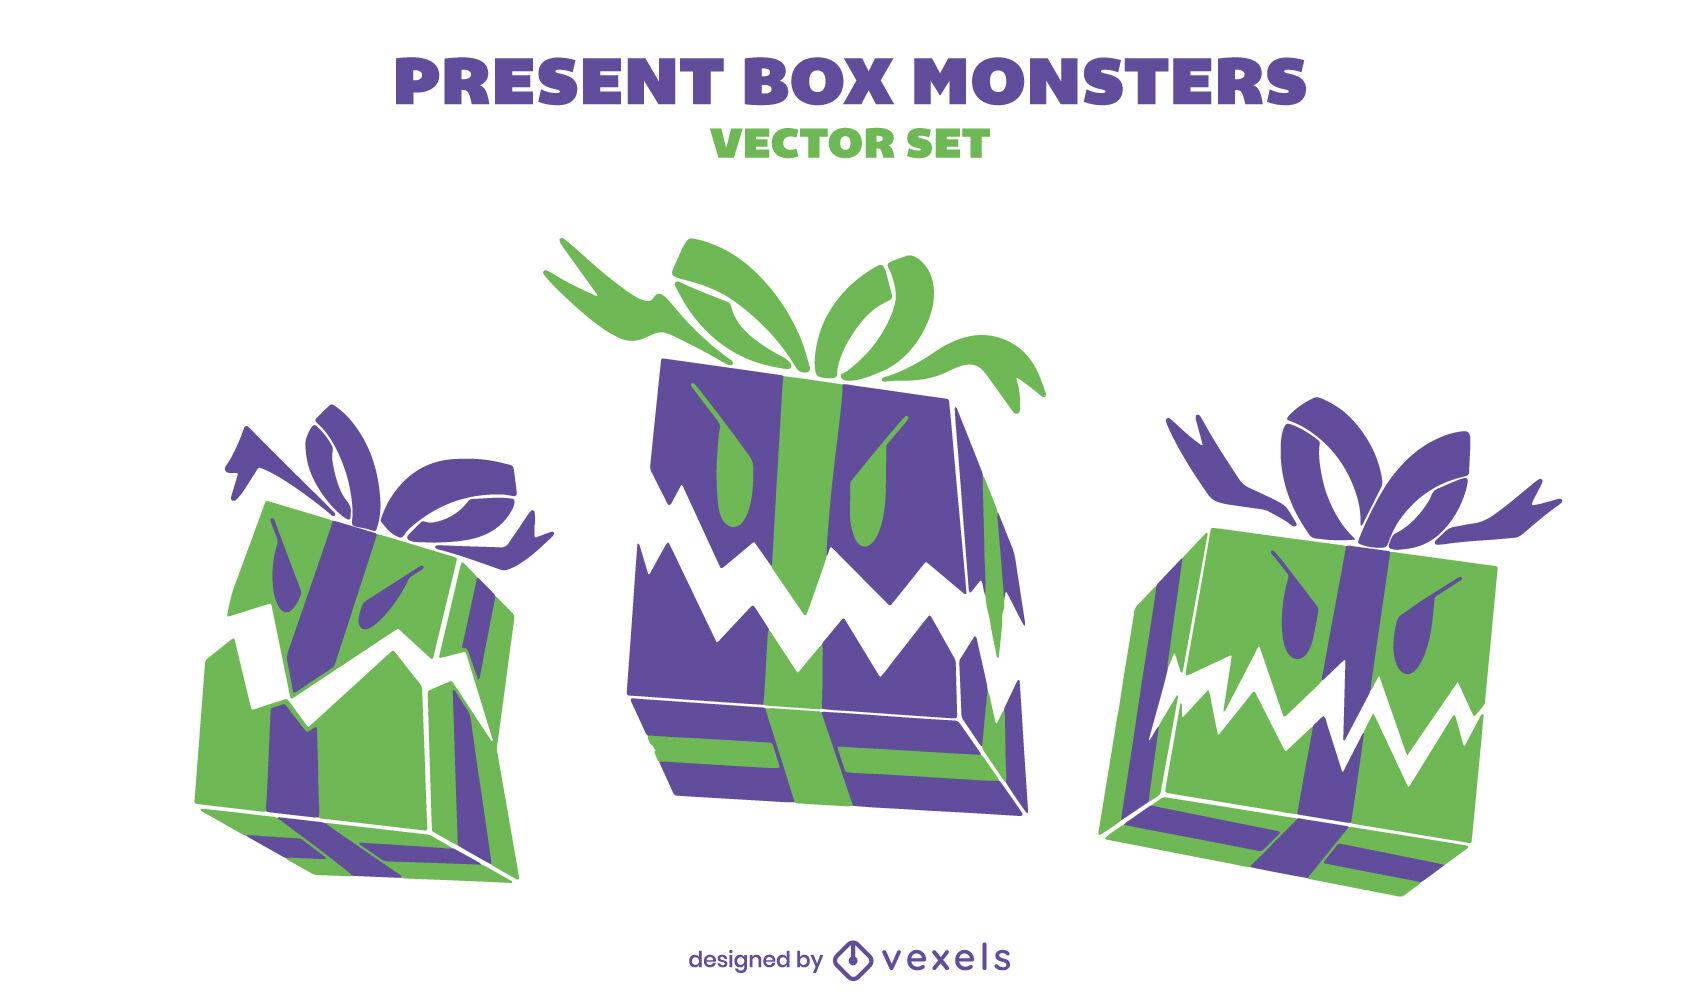 Angry Geschenkbox Monster präsentiert Trio-Set